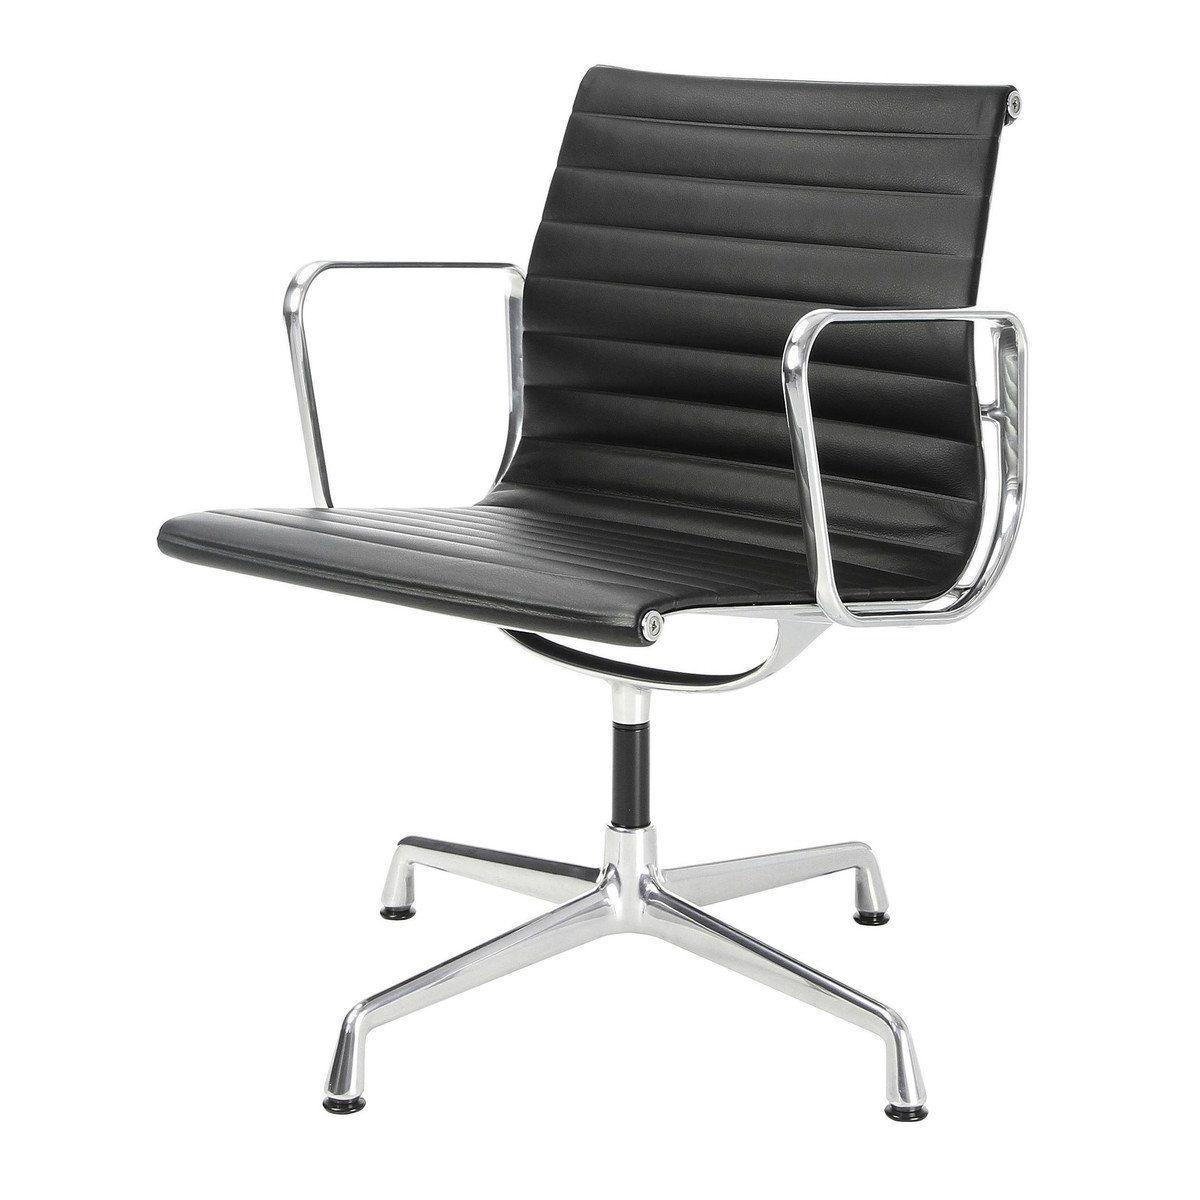 Bürostuhl Vitra vitra ea 108 aluminium chair bürostuhl vitra ambientedirect com